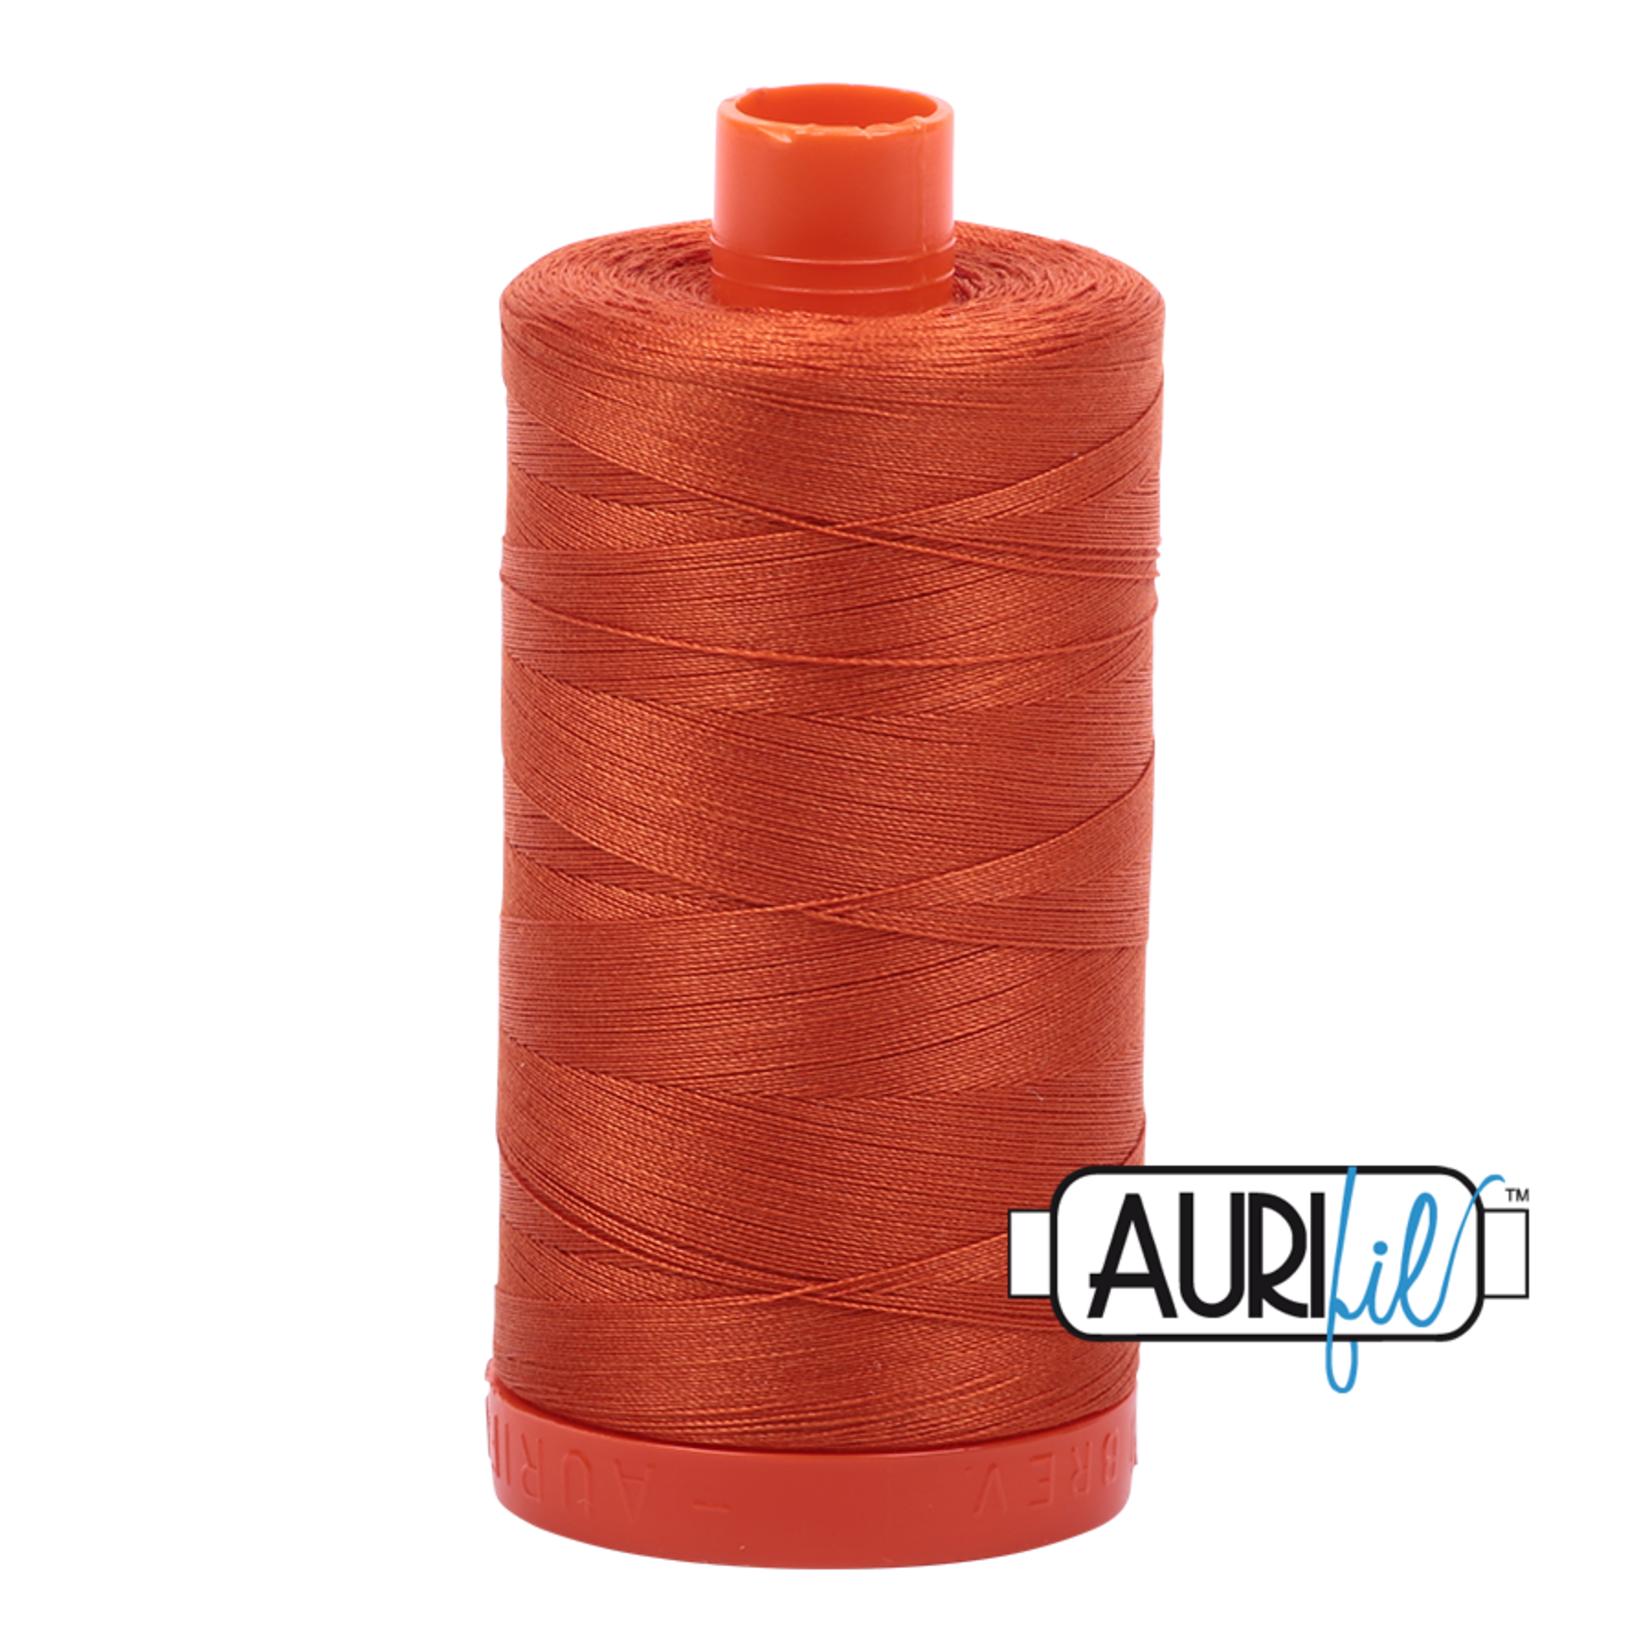 AURIFIL AURIFIL 50 WT Rusty Orange 2240